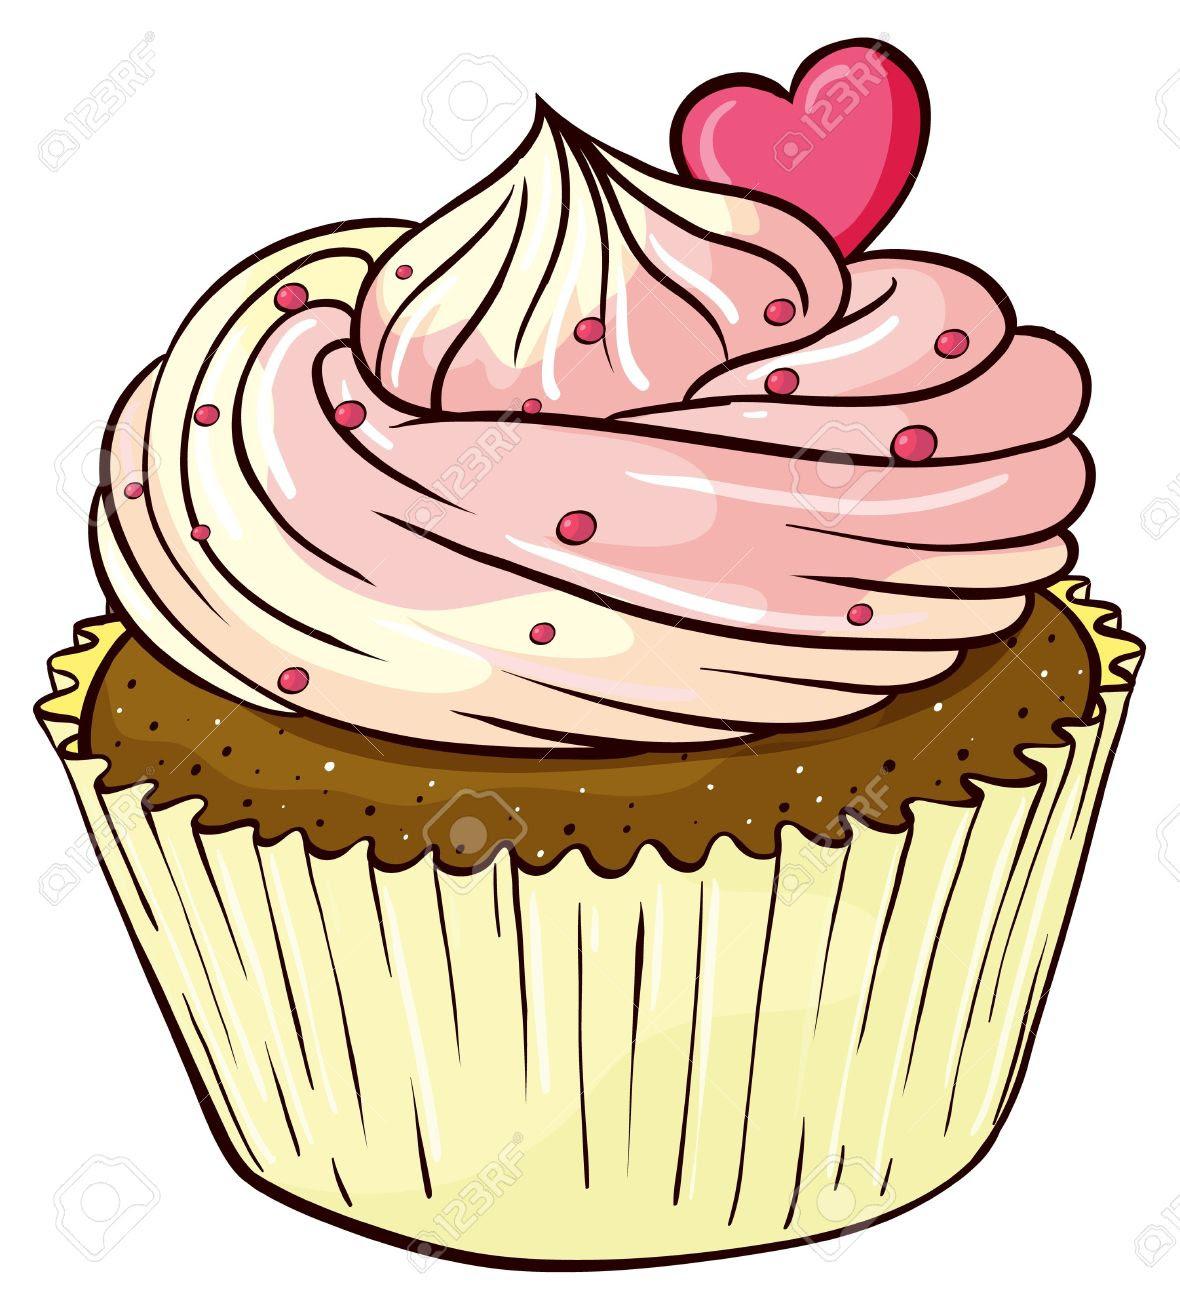 Cartoon Cupcake For Childrens